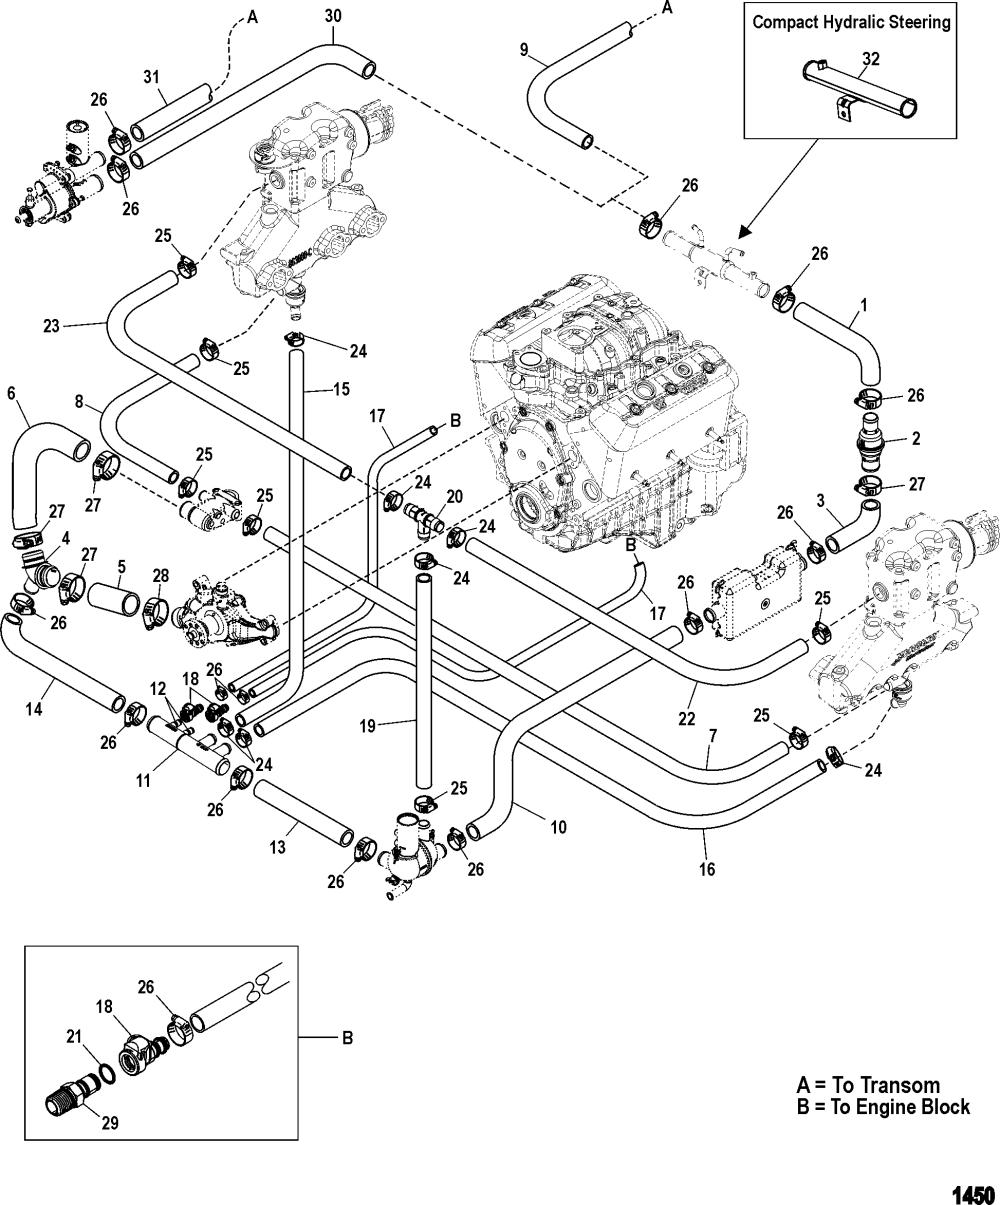 medium resolution of mercruiser 4 3l engine diagram wiring diagram used mercruiser 3 0 engine diagram